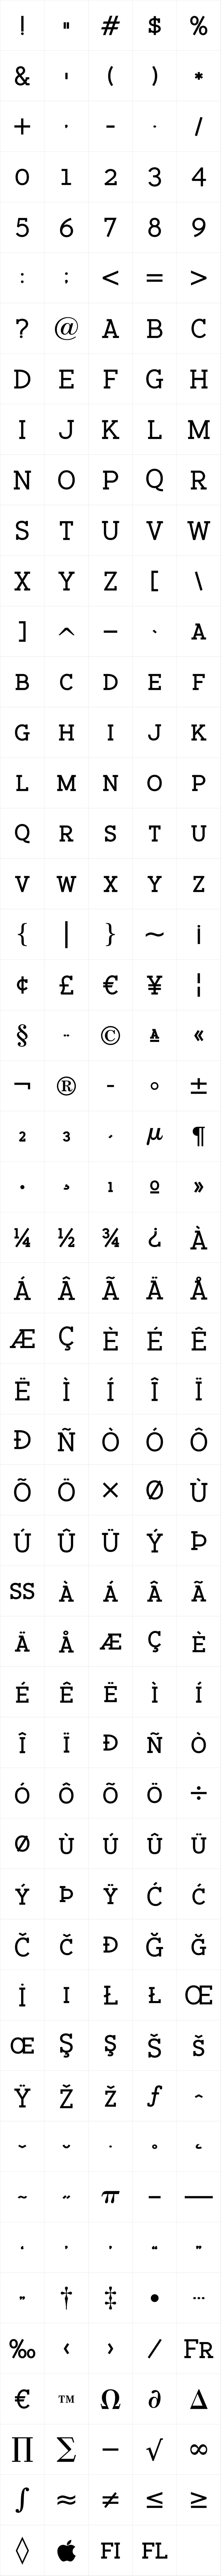 Backtalk Serif BTN SC Bold